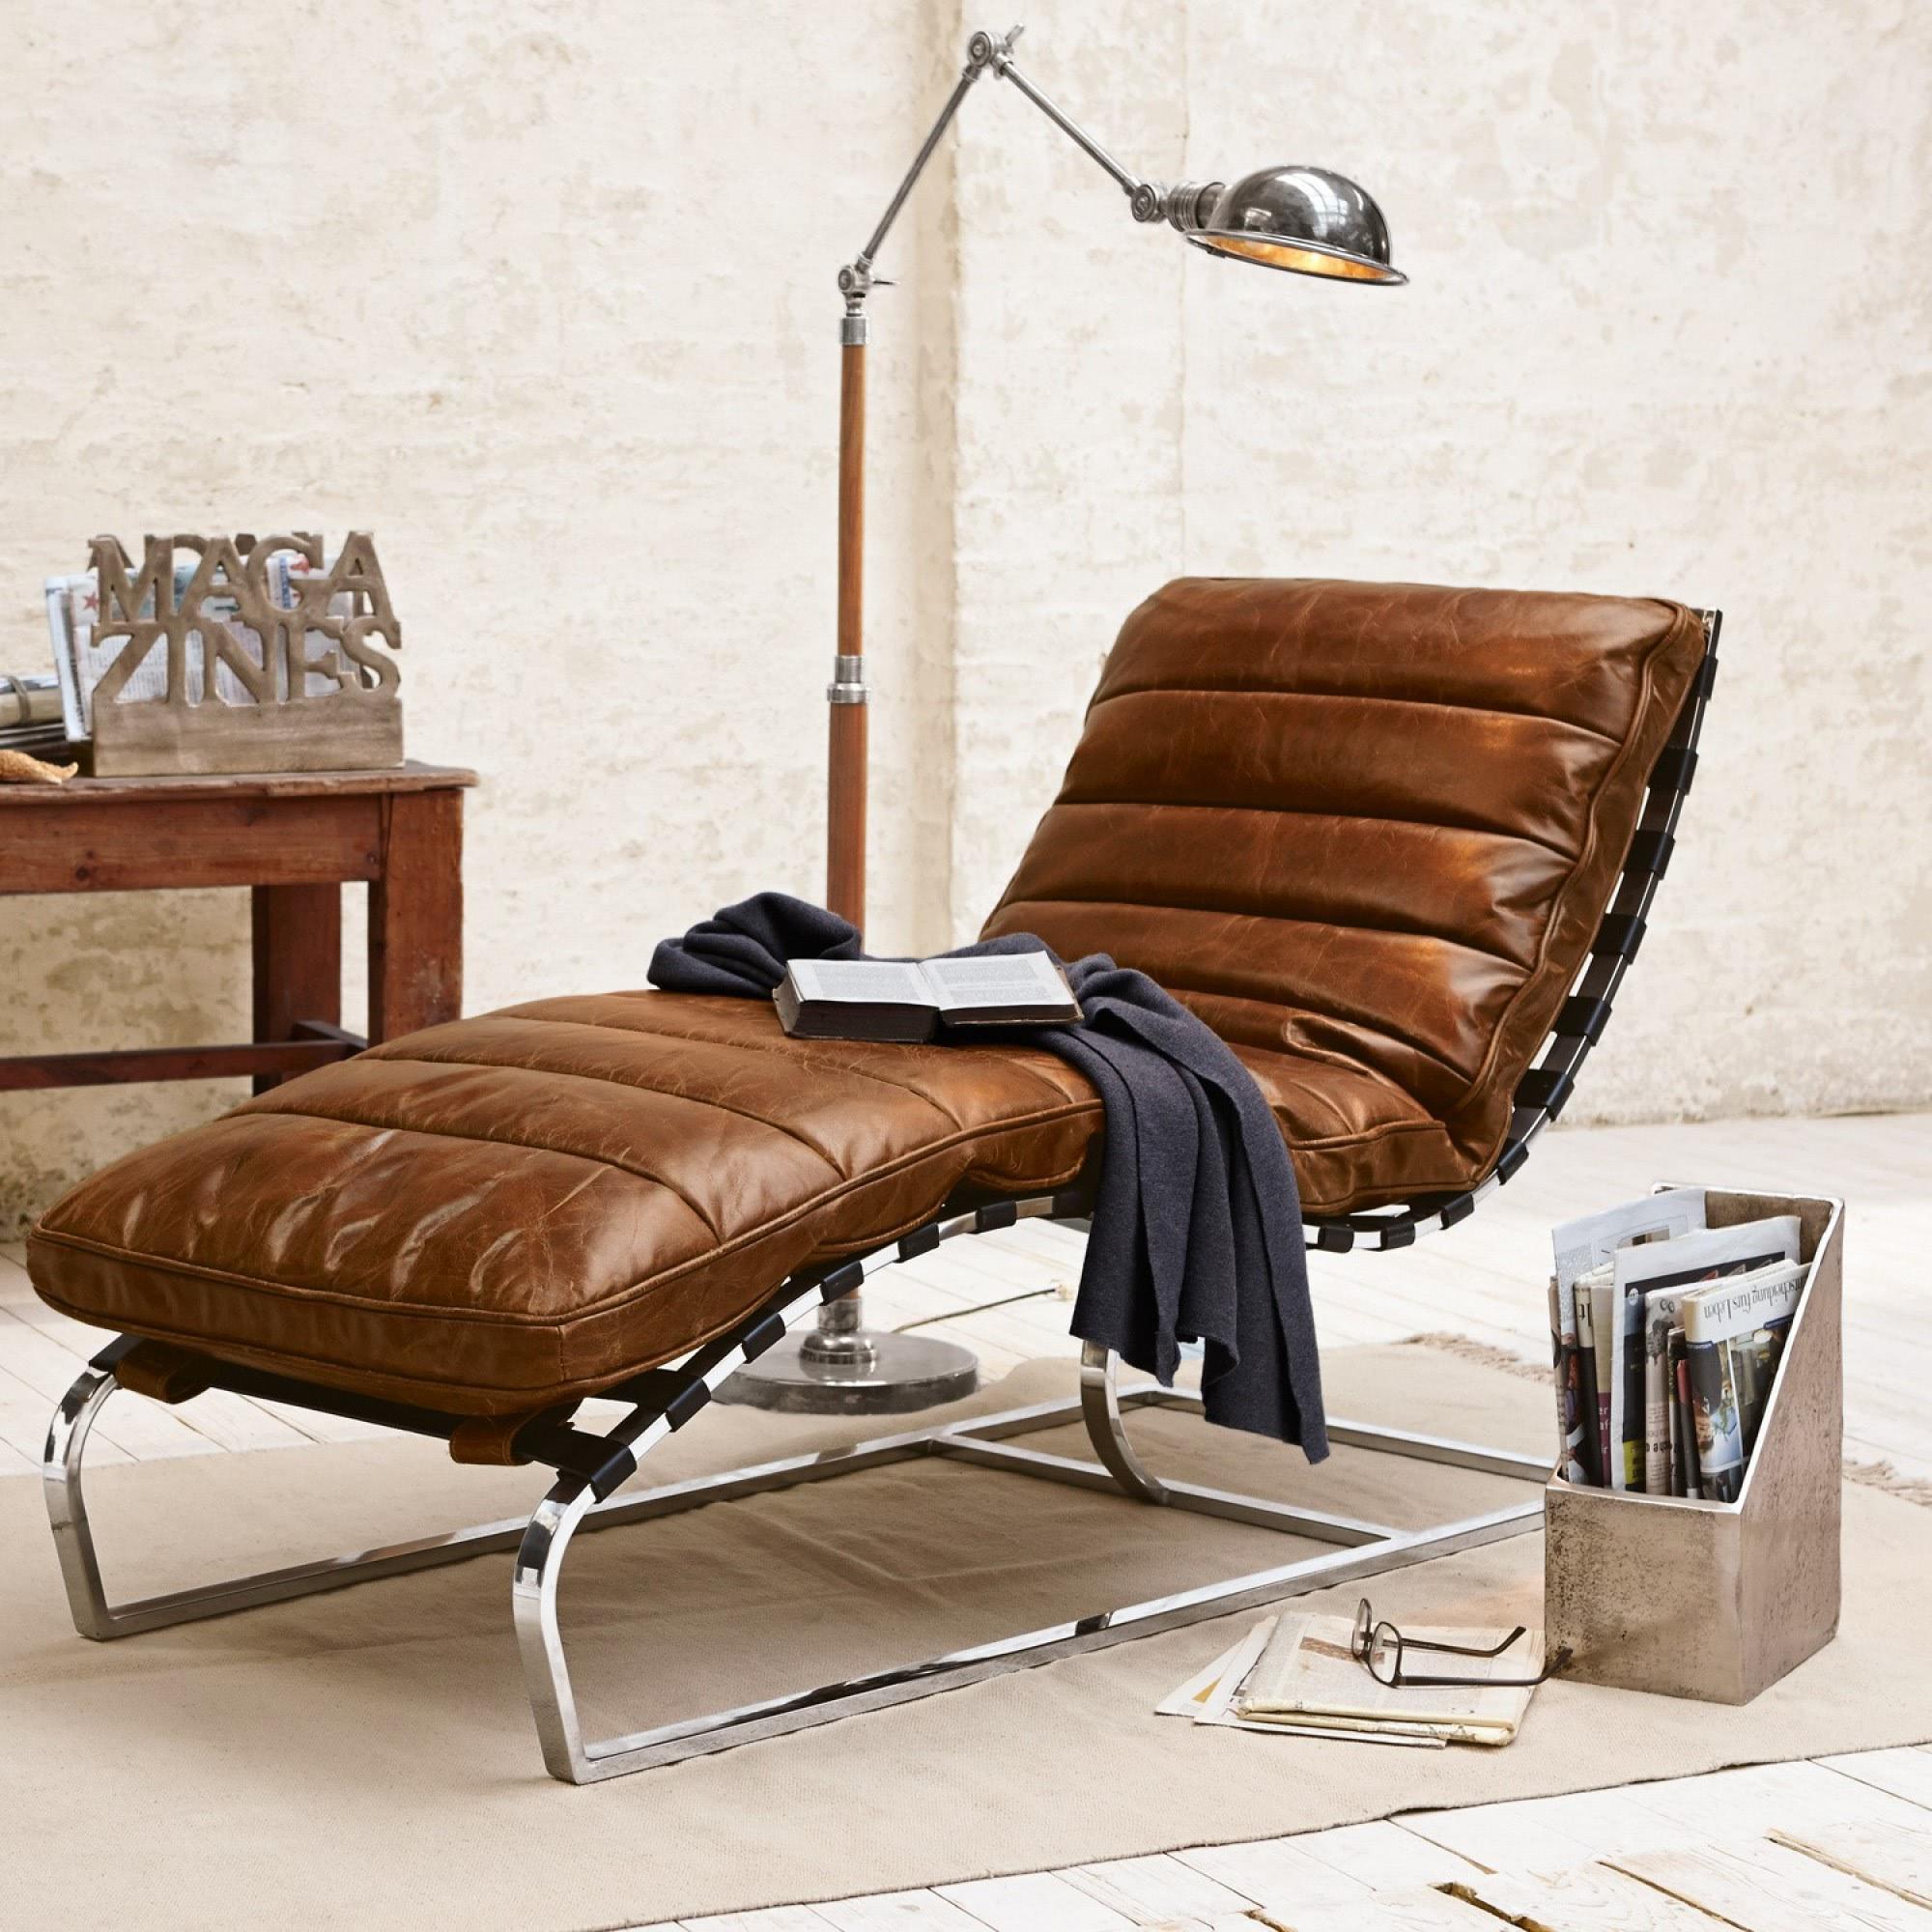 lounger van buren loberon coming home. Black Bedroom Furniture Sets. Home Design Ideas